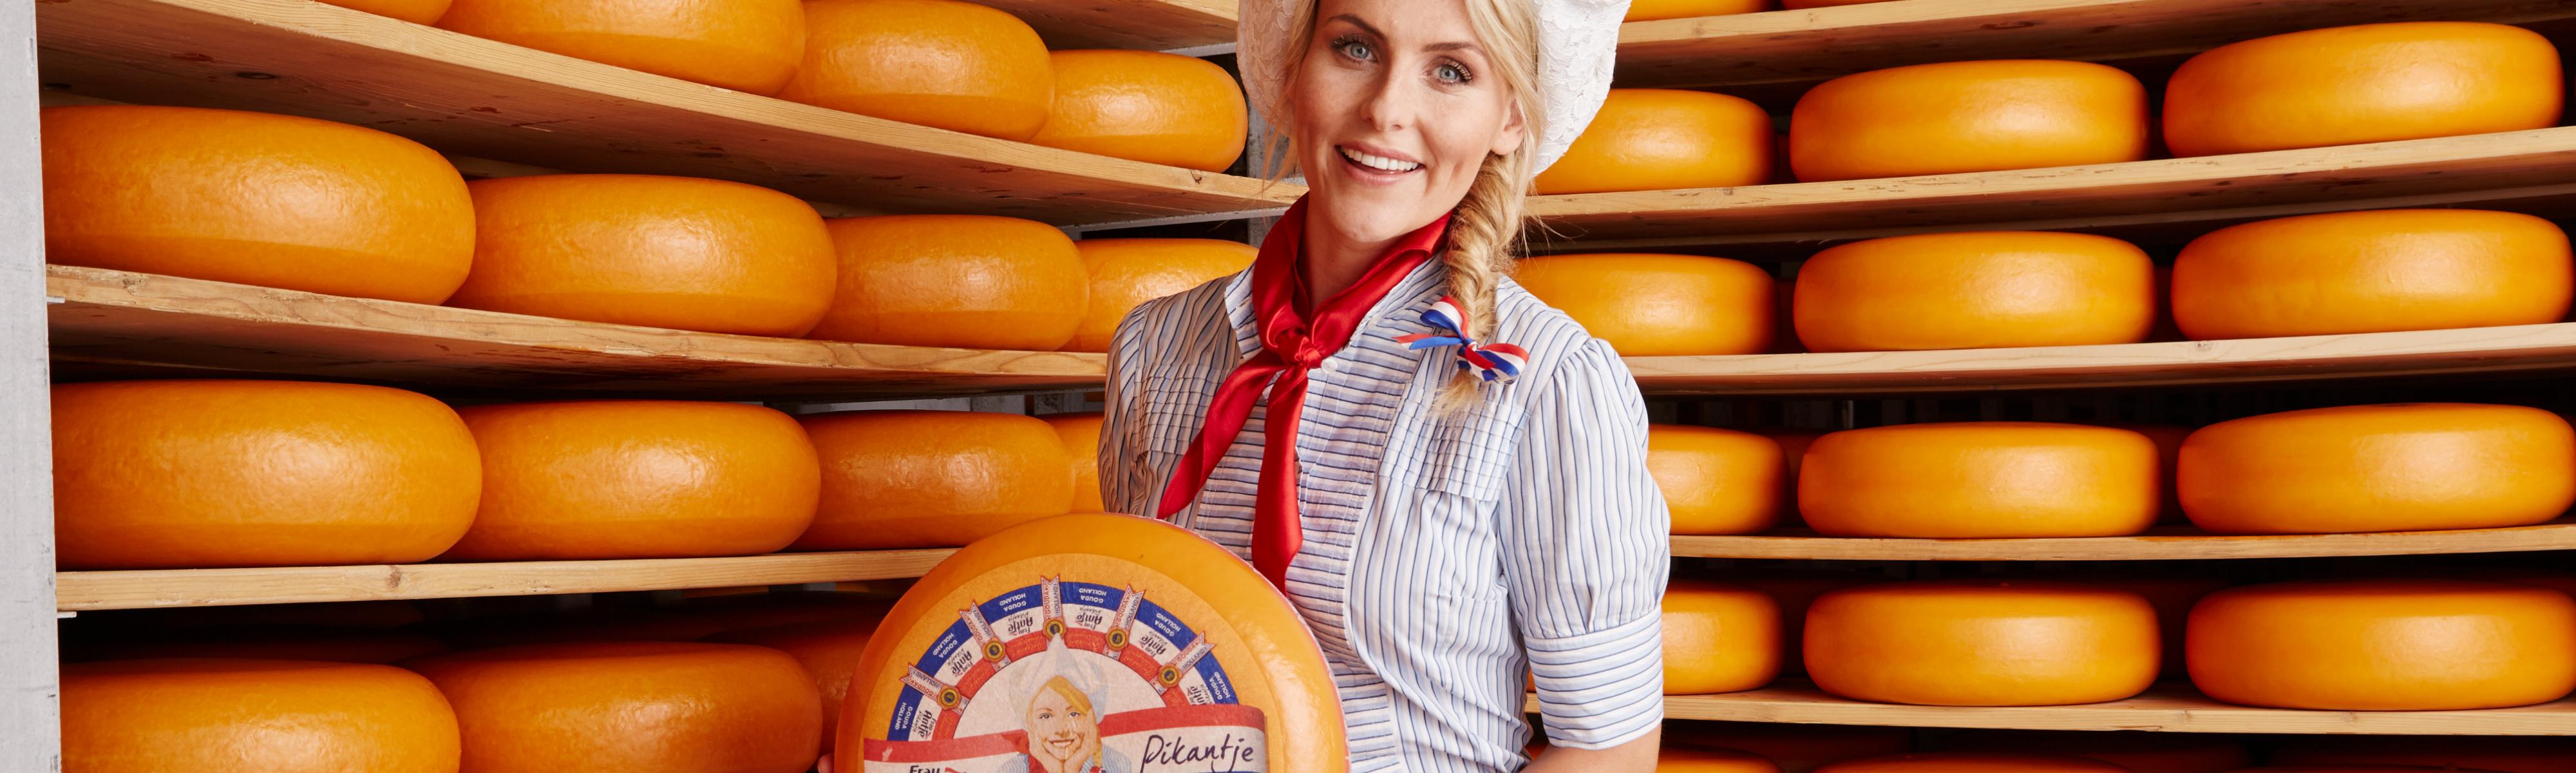 Kaasmeisje met hele kaas tussen de kazen